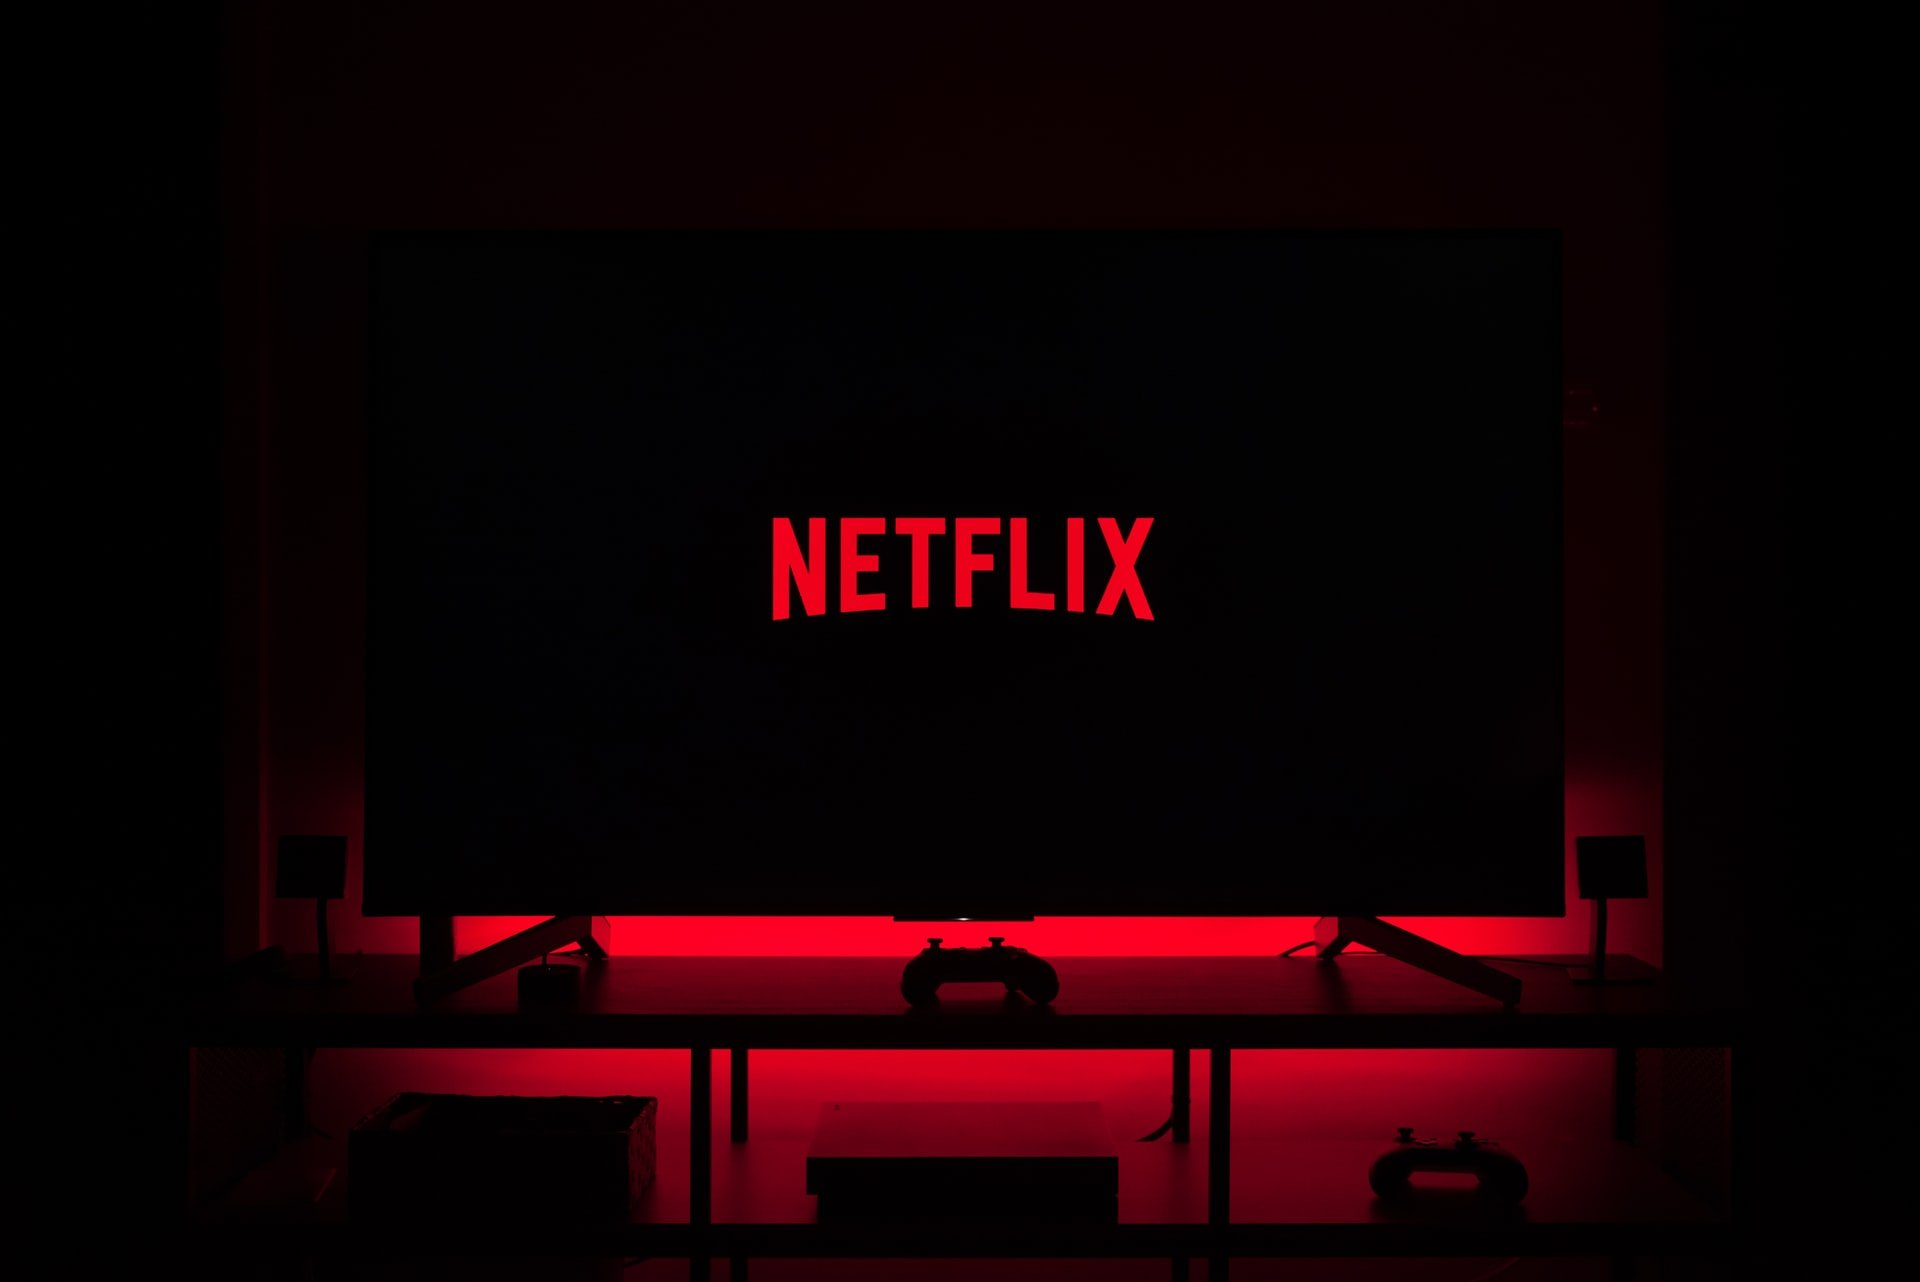 How to Watch Netflix Originals for Free